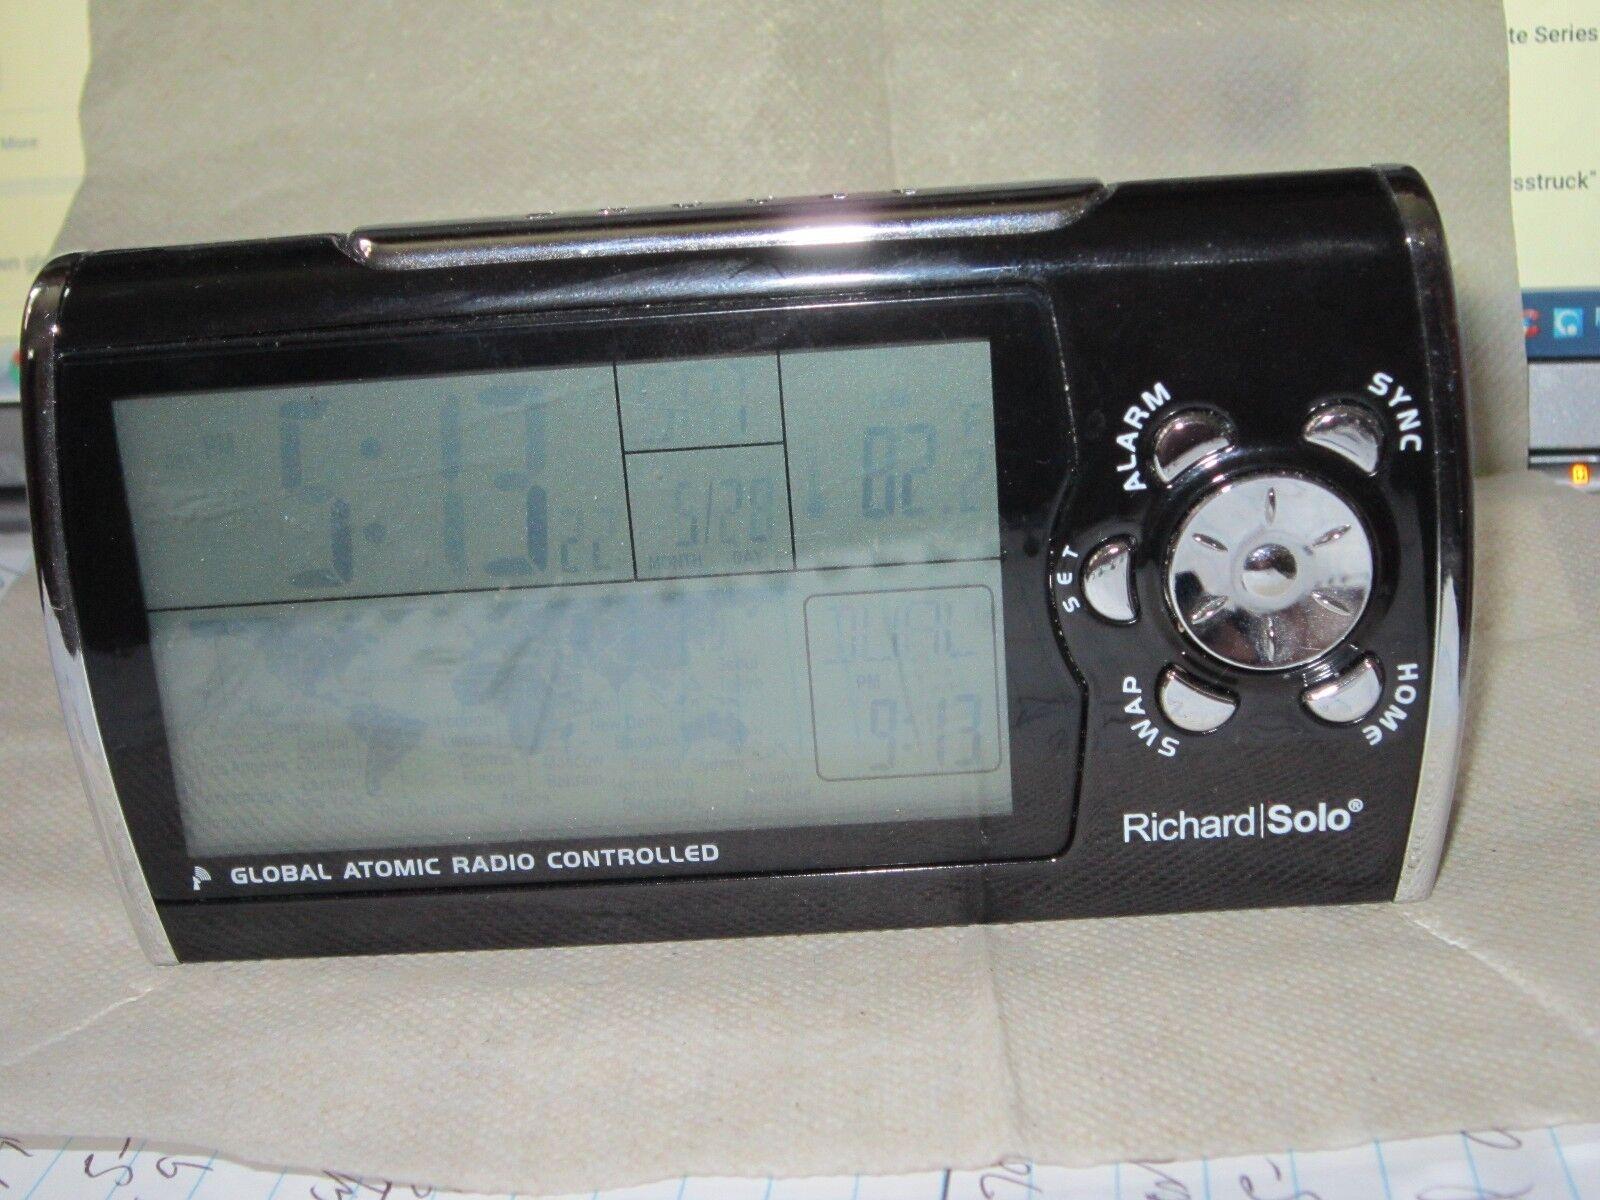 Richard Solo Global Atomic Radio Controlled Clock